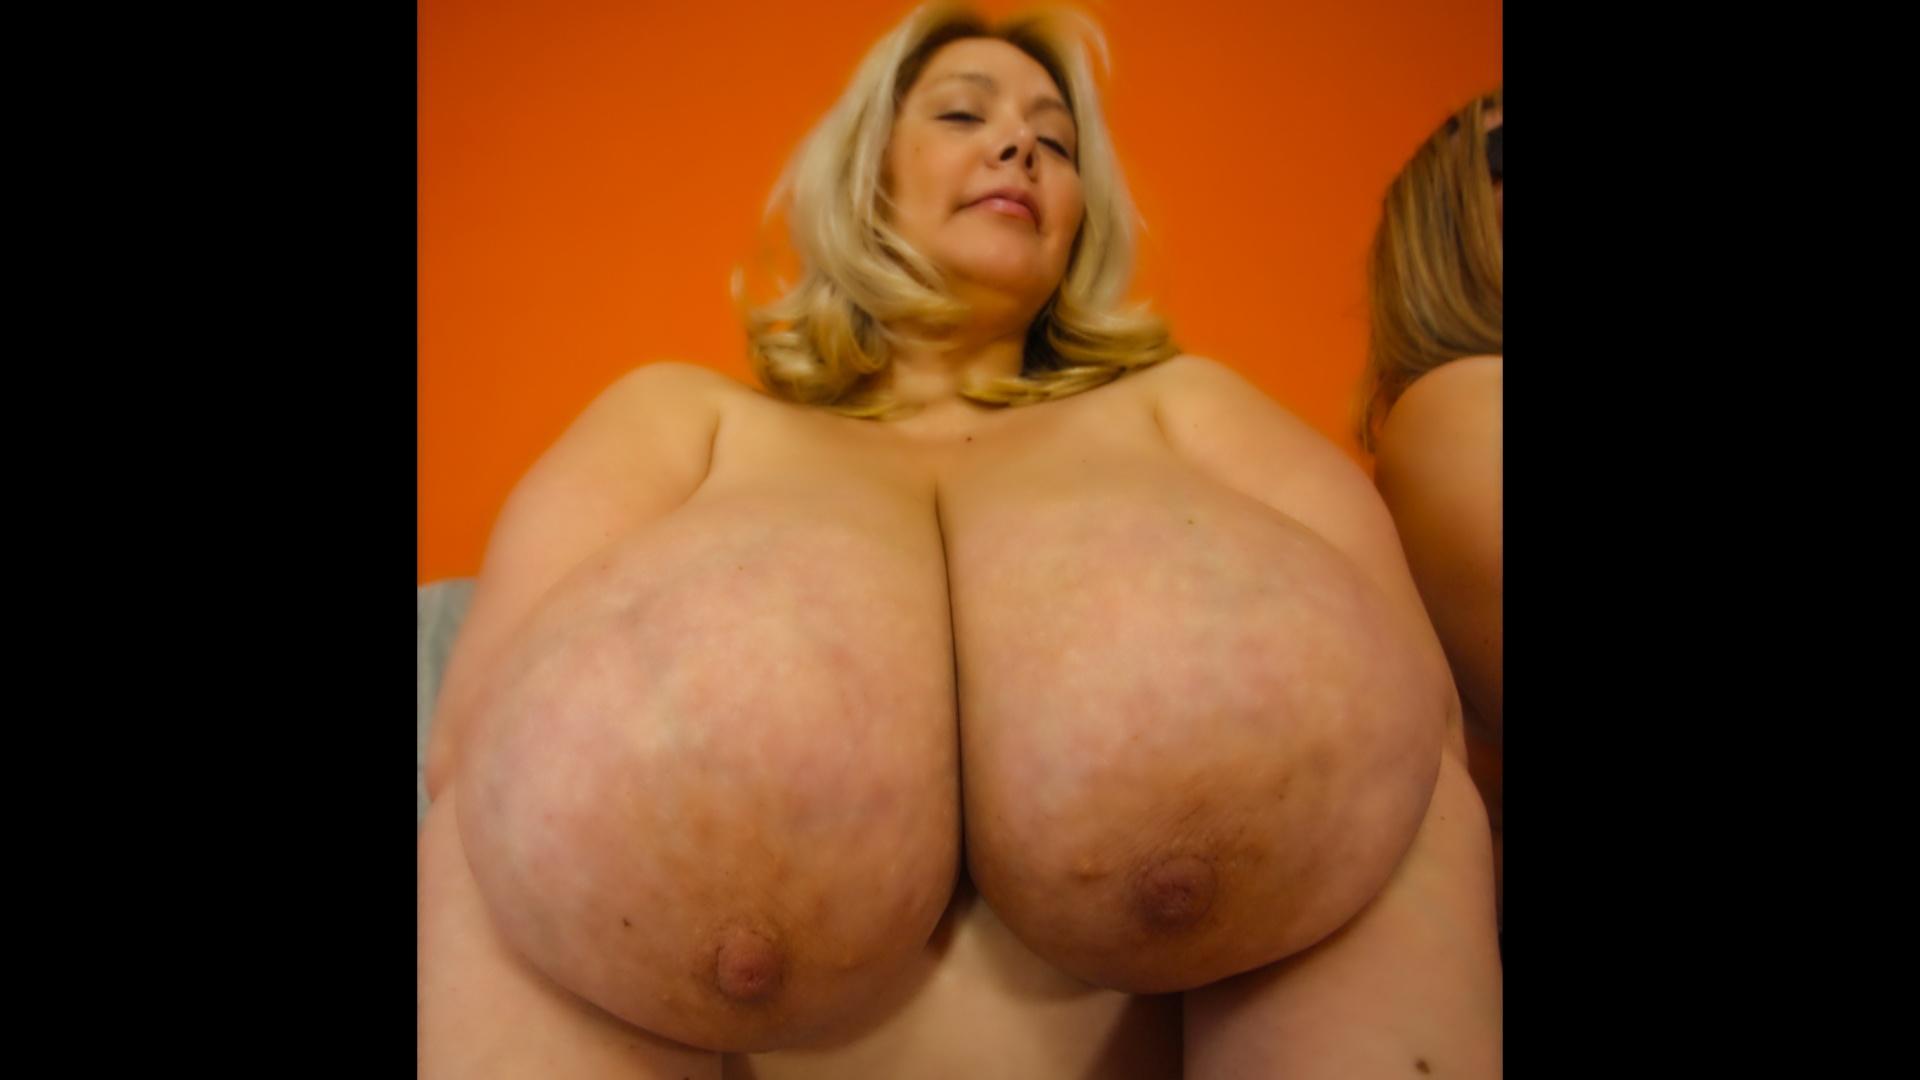 Renaissance fair busty girl pics